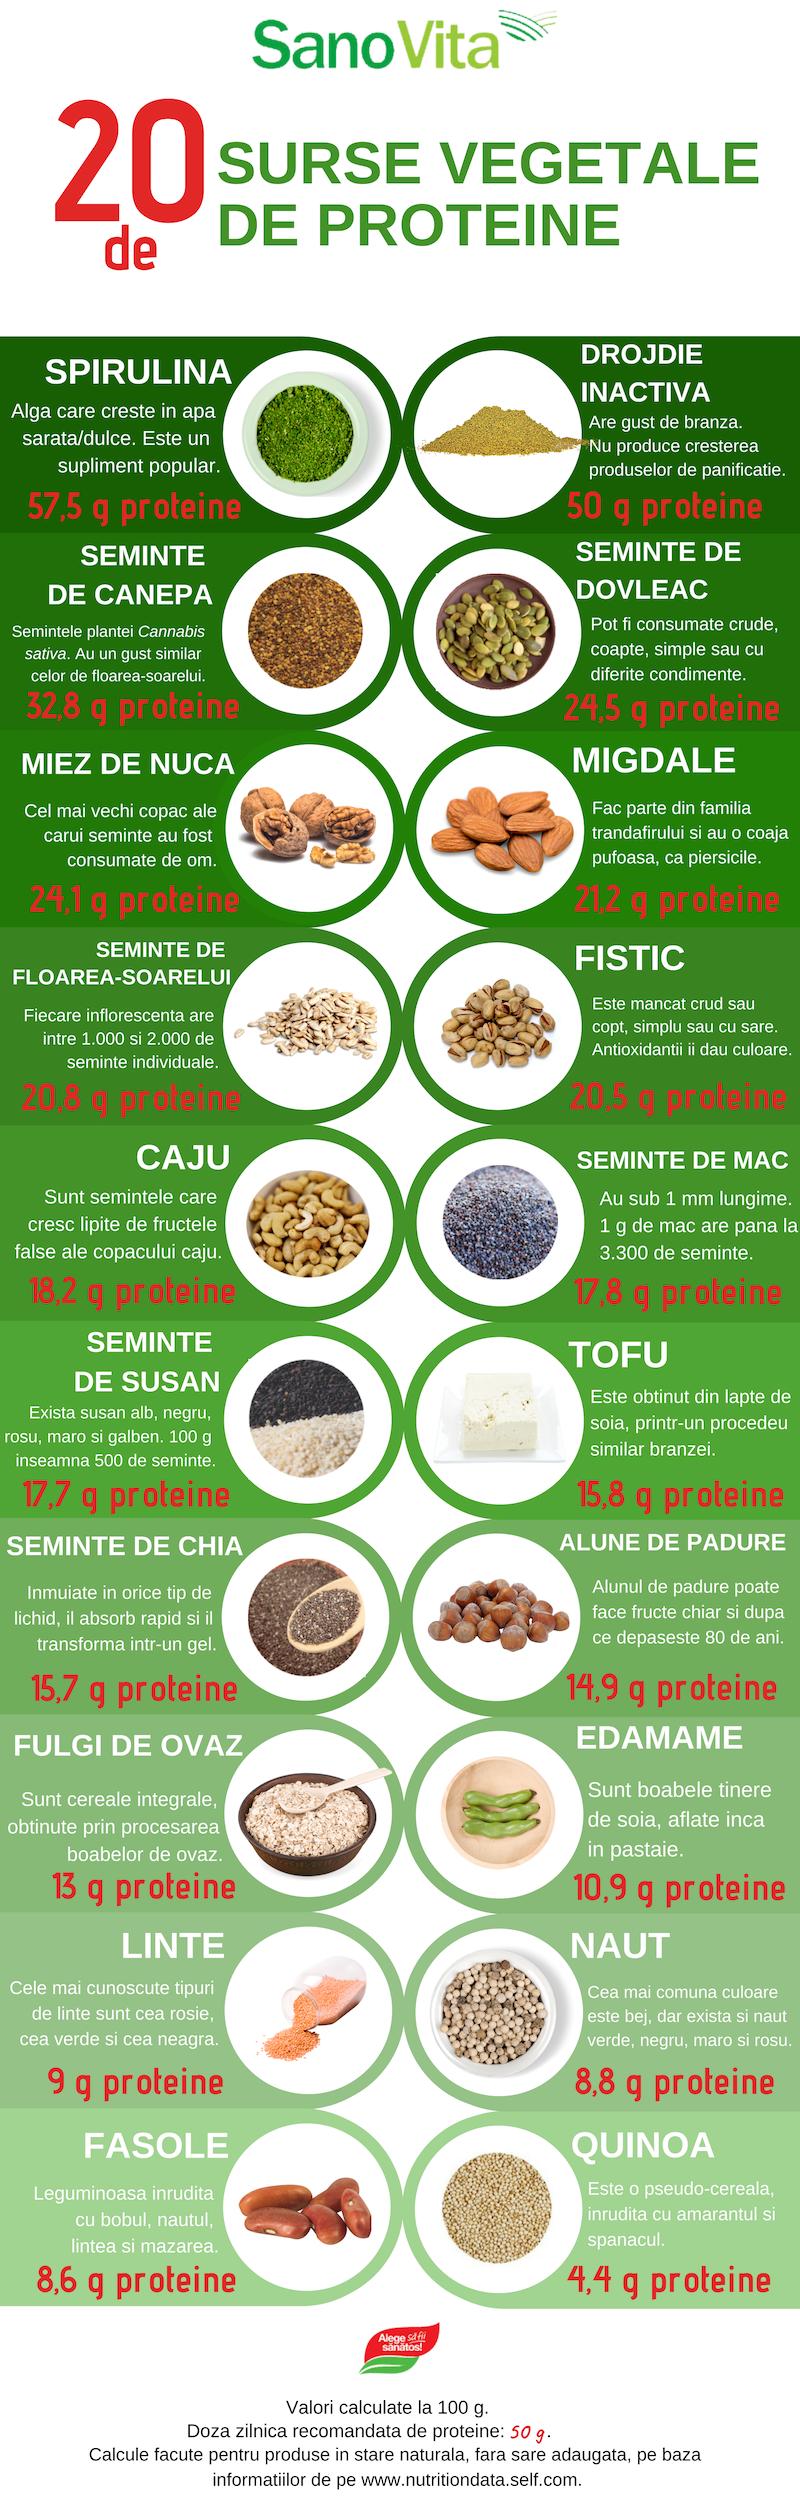 20 de surse de proteine vegetale